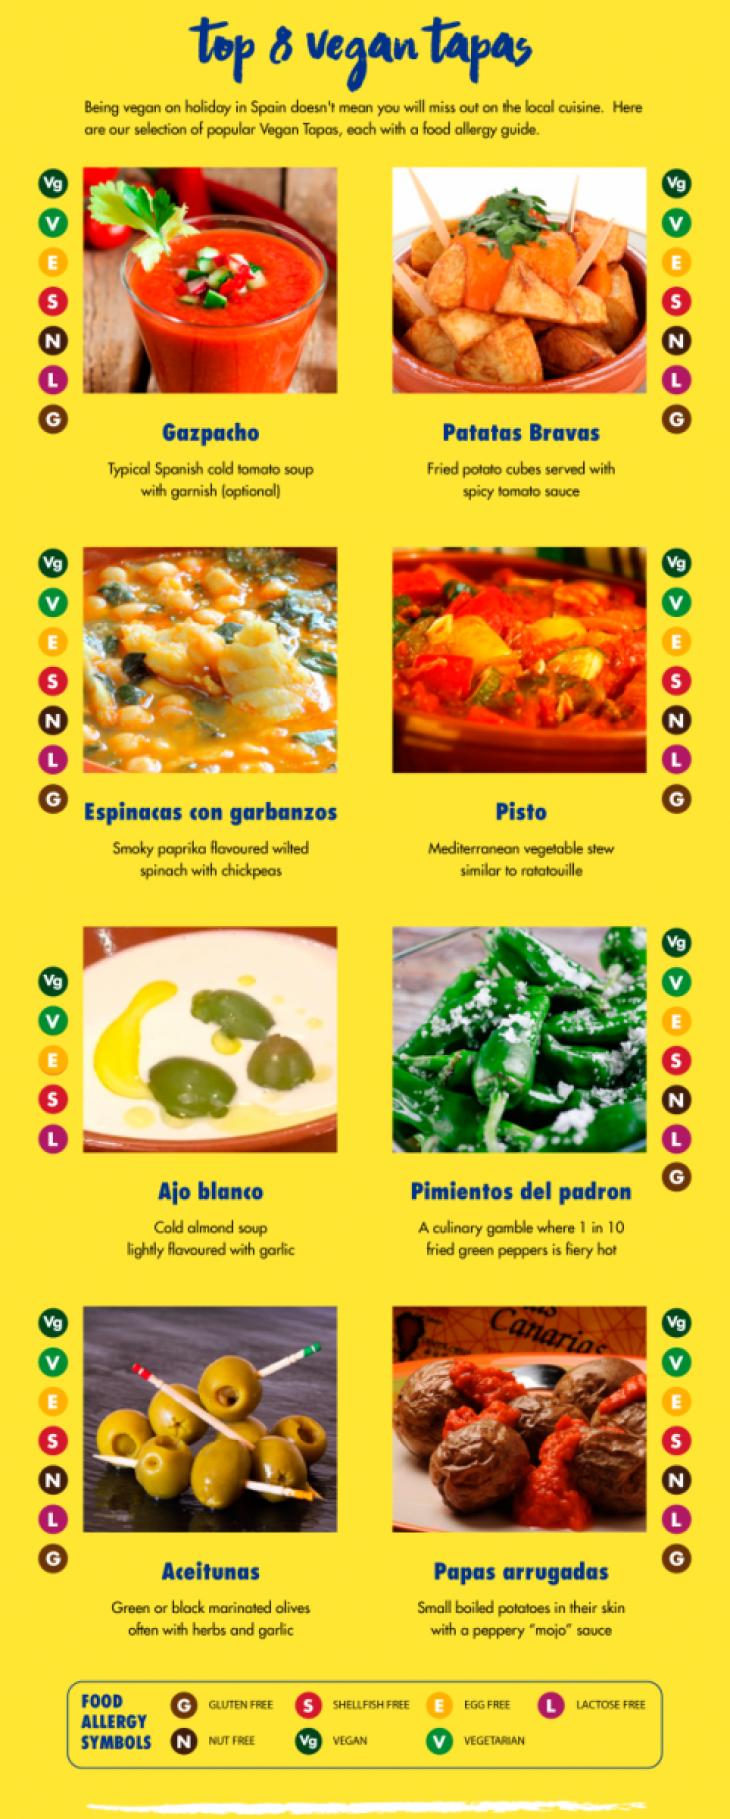 Top 8 Vegan Tapas - World Tapas Day